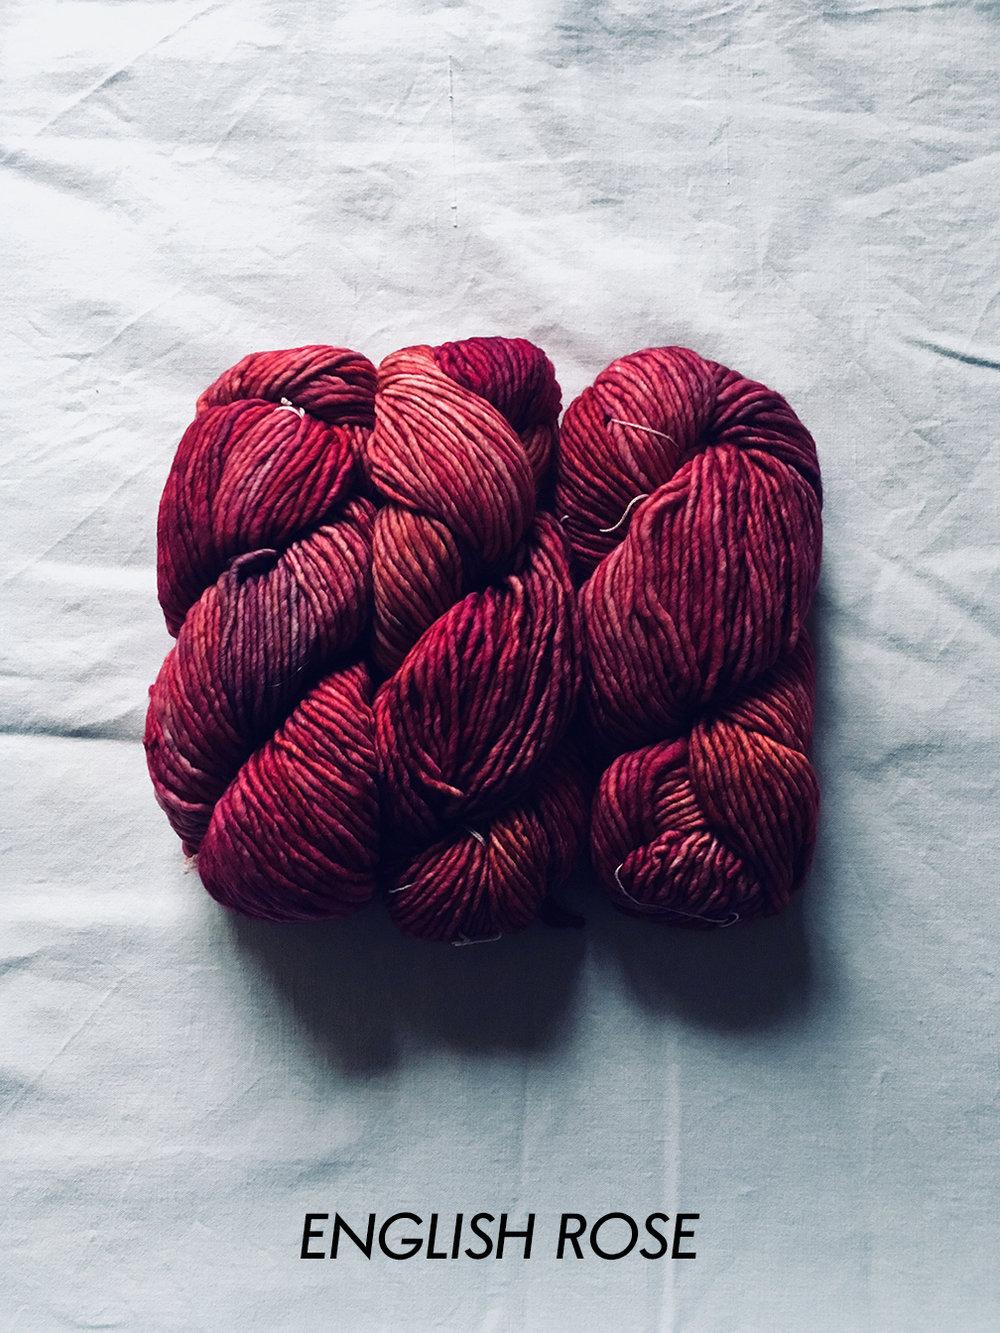 malabrigo_mecha_english_057_rose_wool_done_knitting.jpg